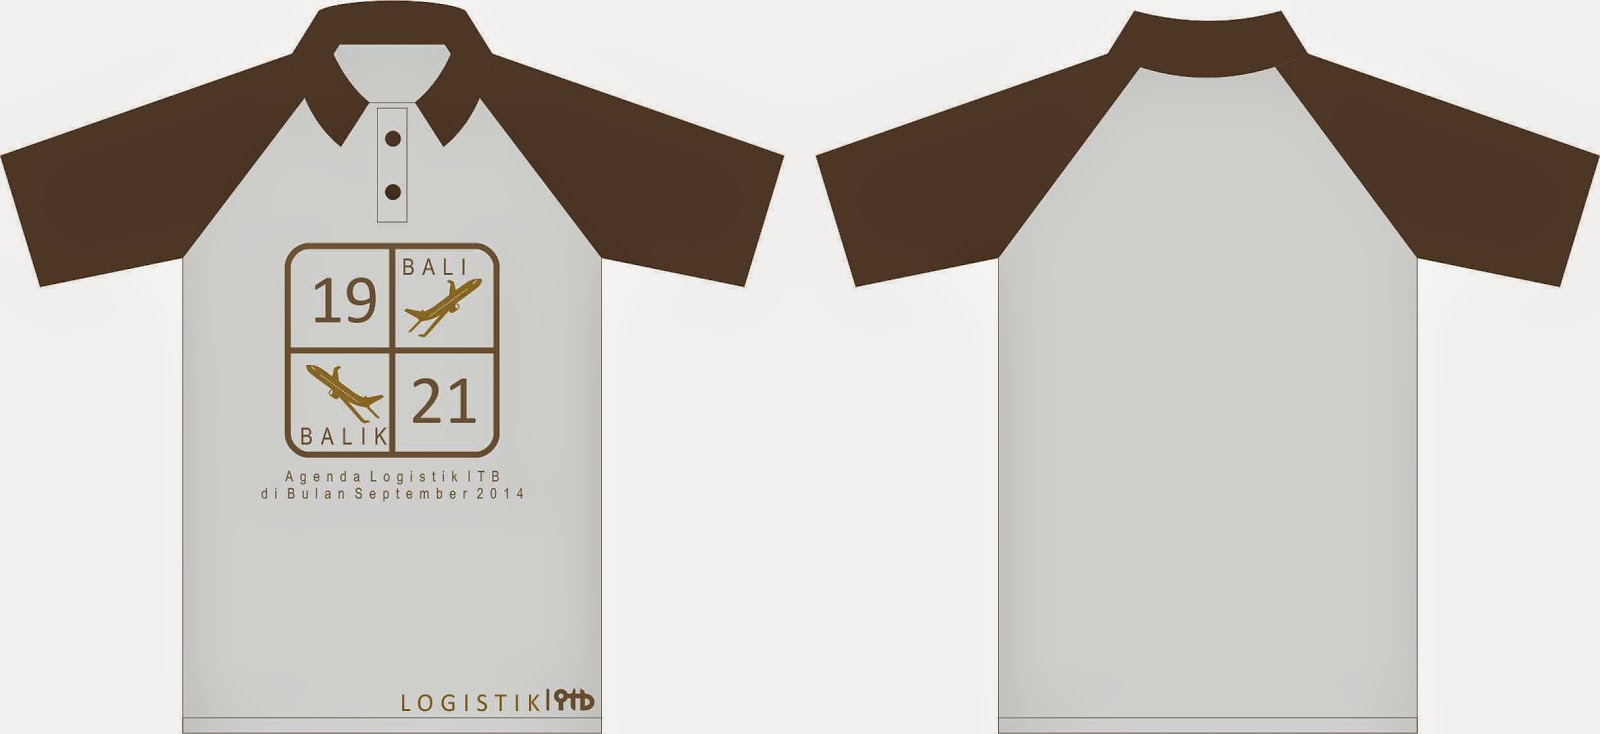 Radella Production: Direktorat Logistik ITB Order